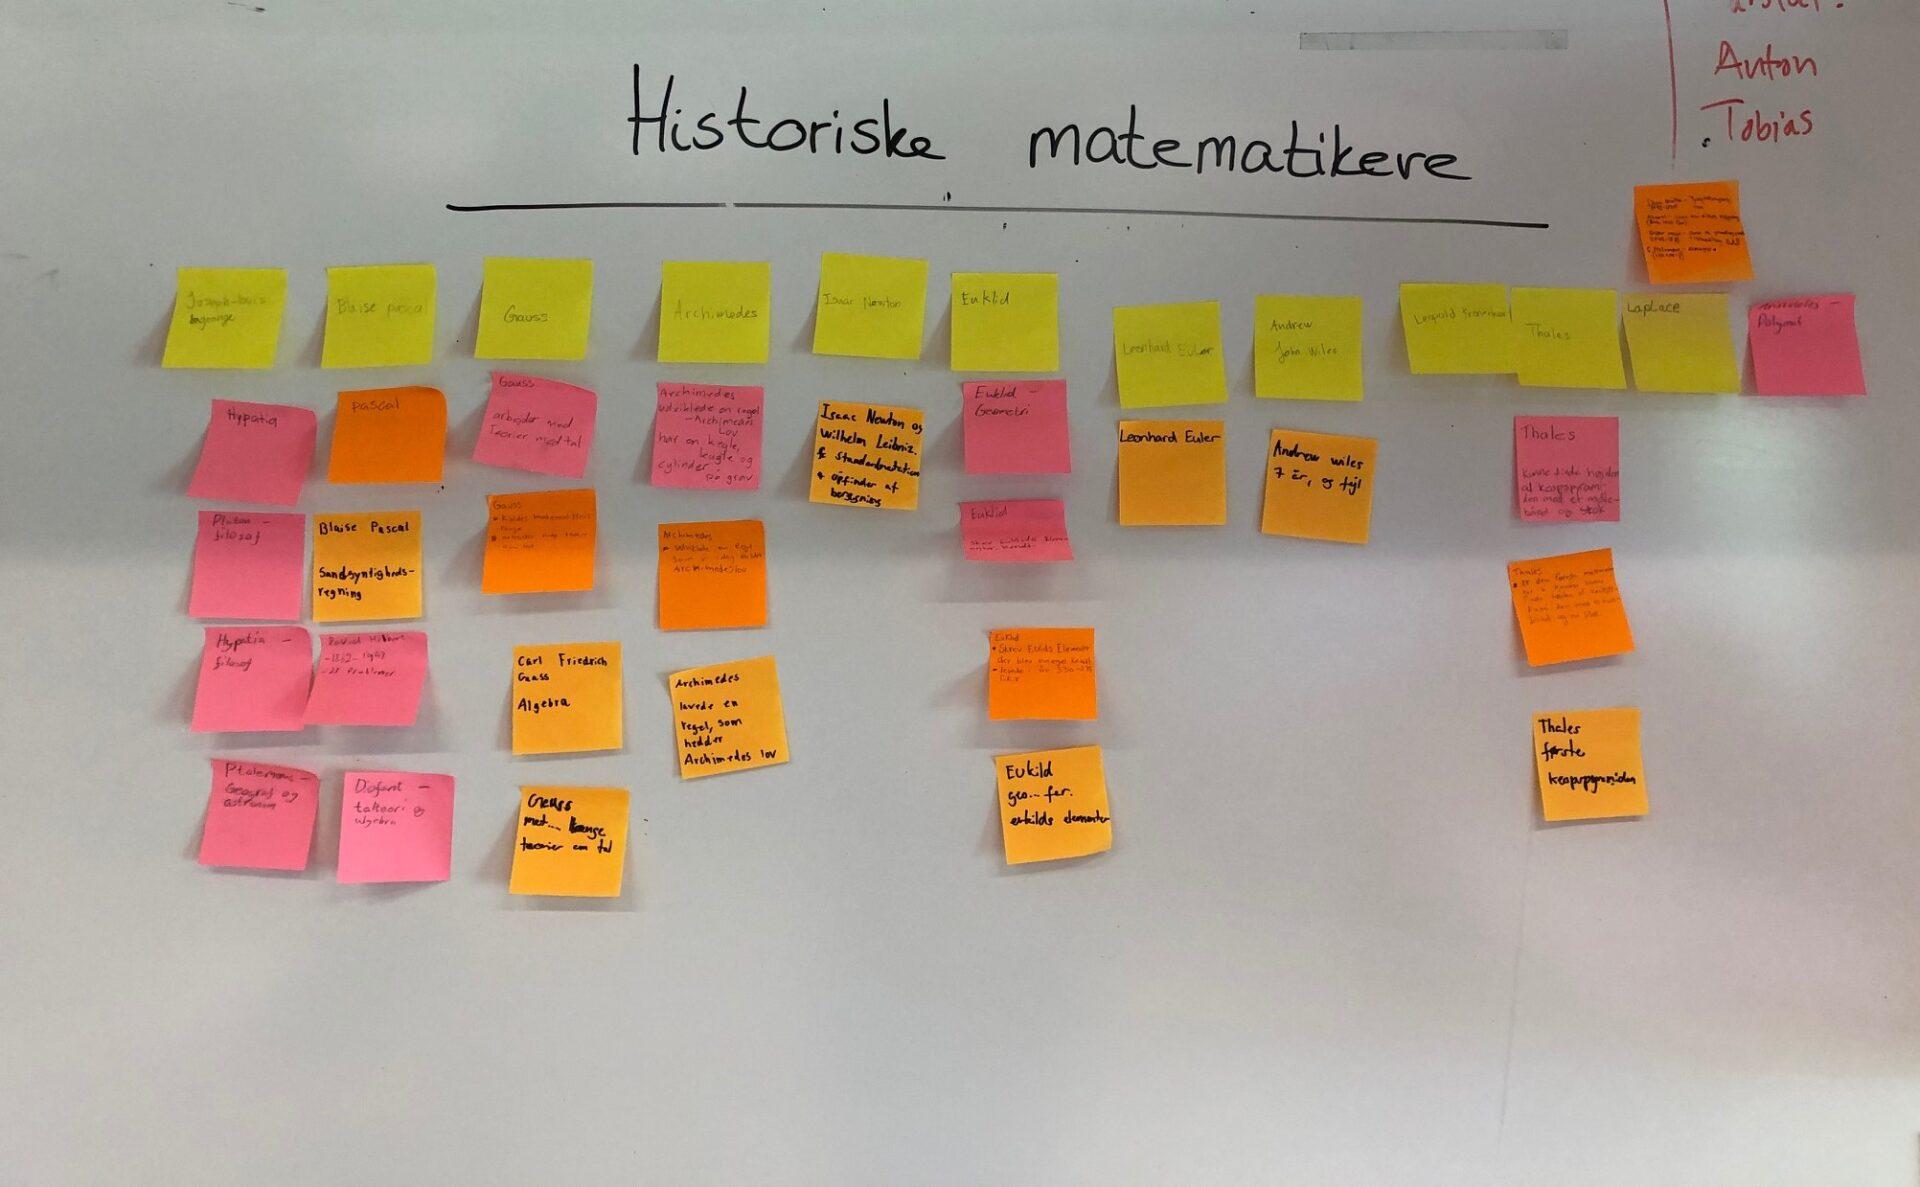 Tavle med mange postit sedler fra brainstorm over historiske matematikere